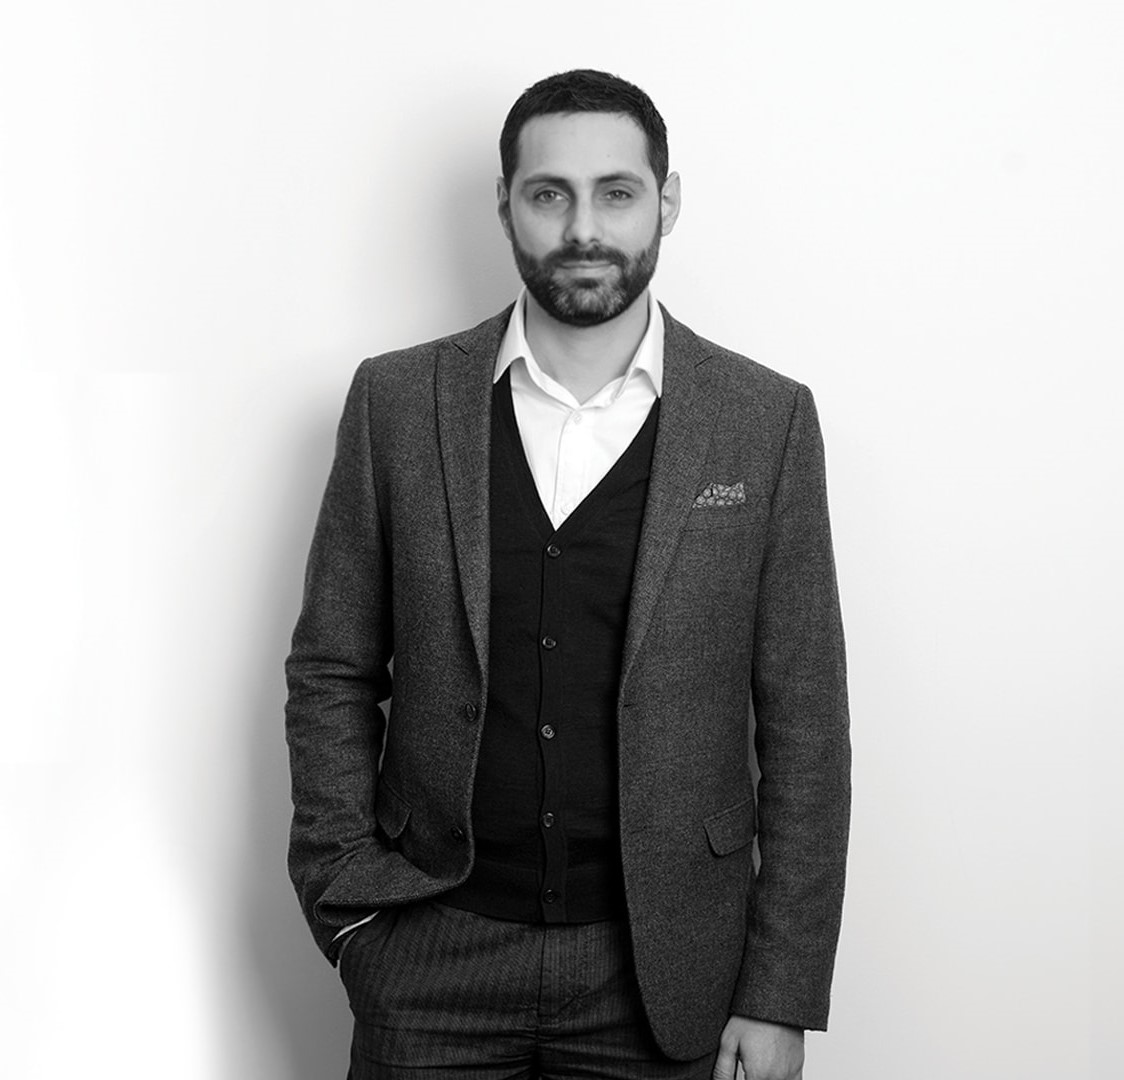 Dimitri Avakian